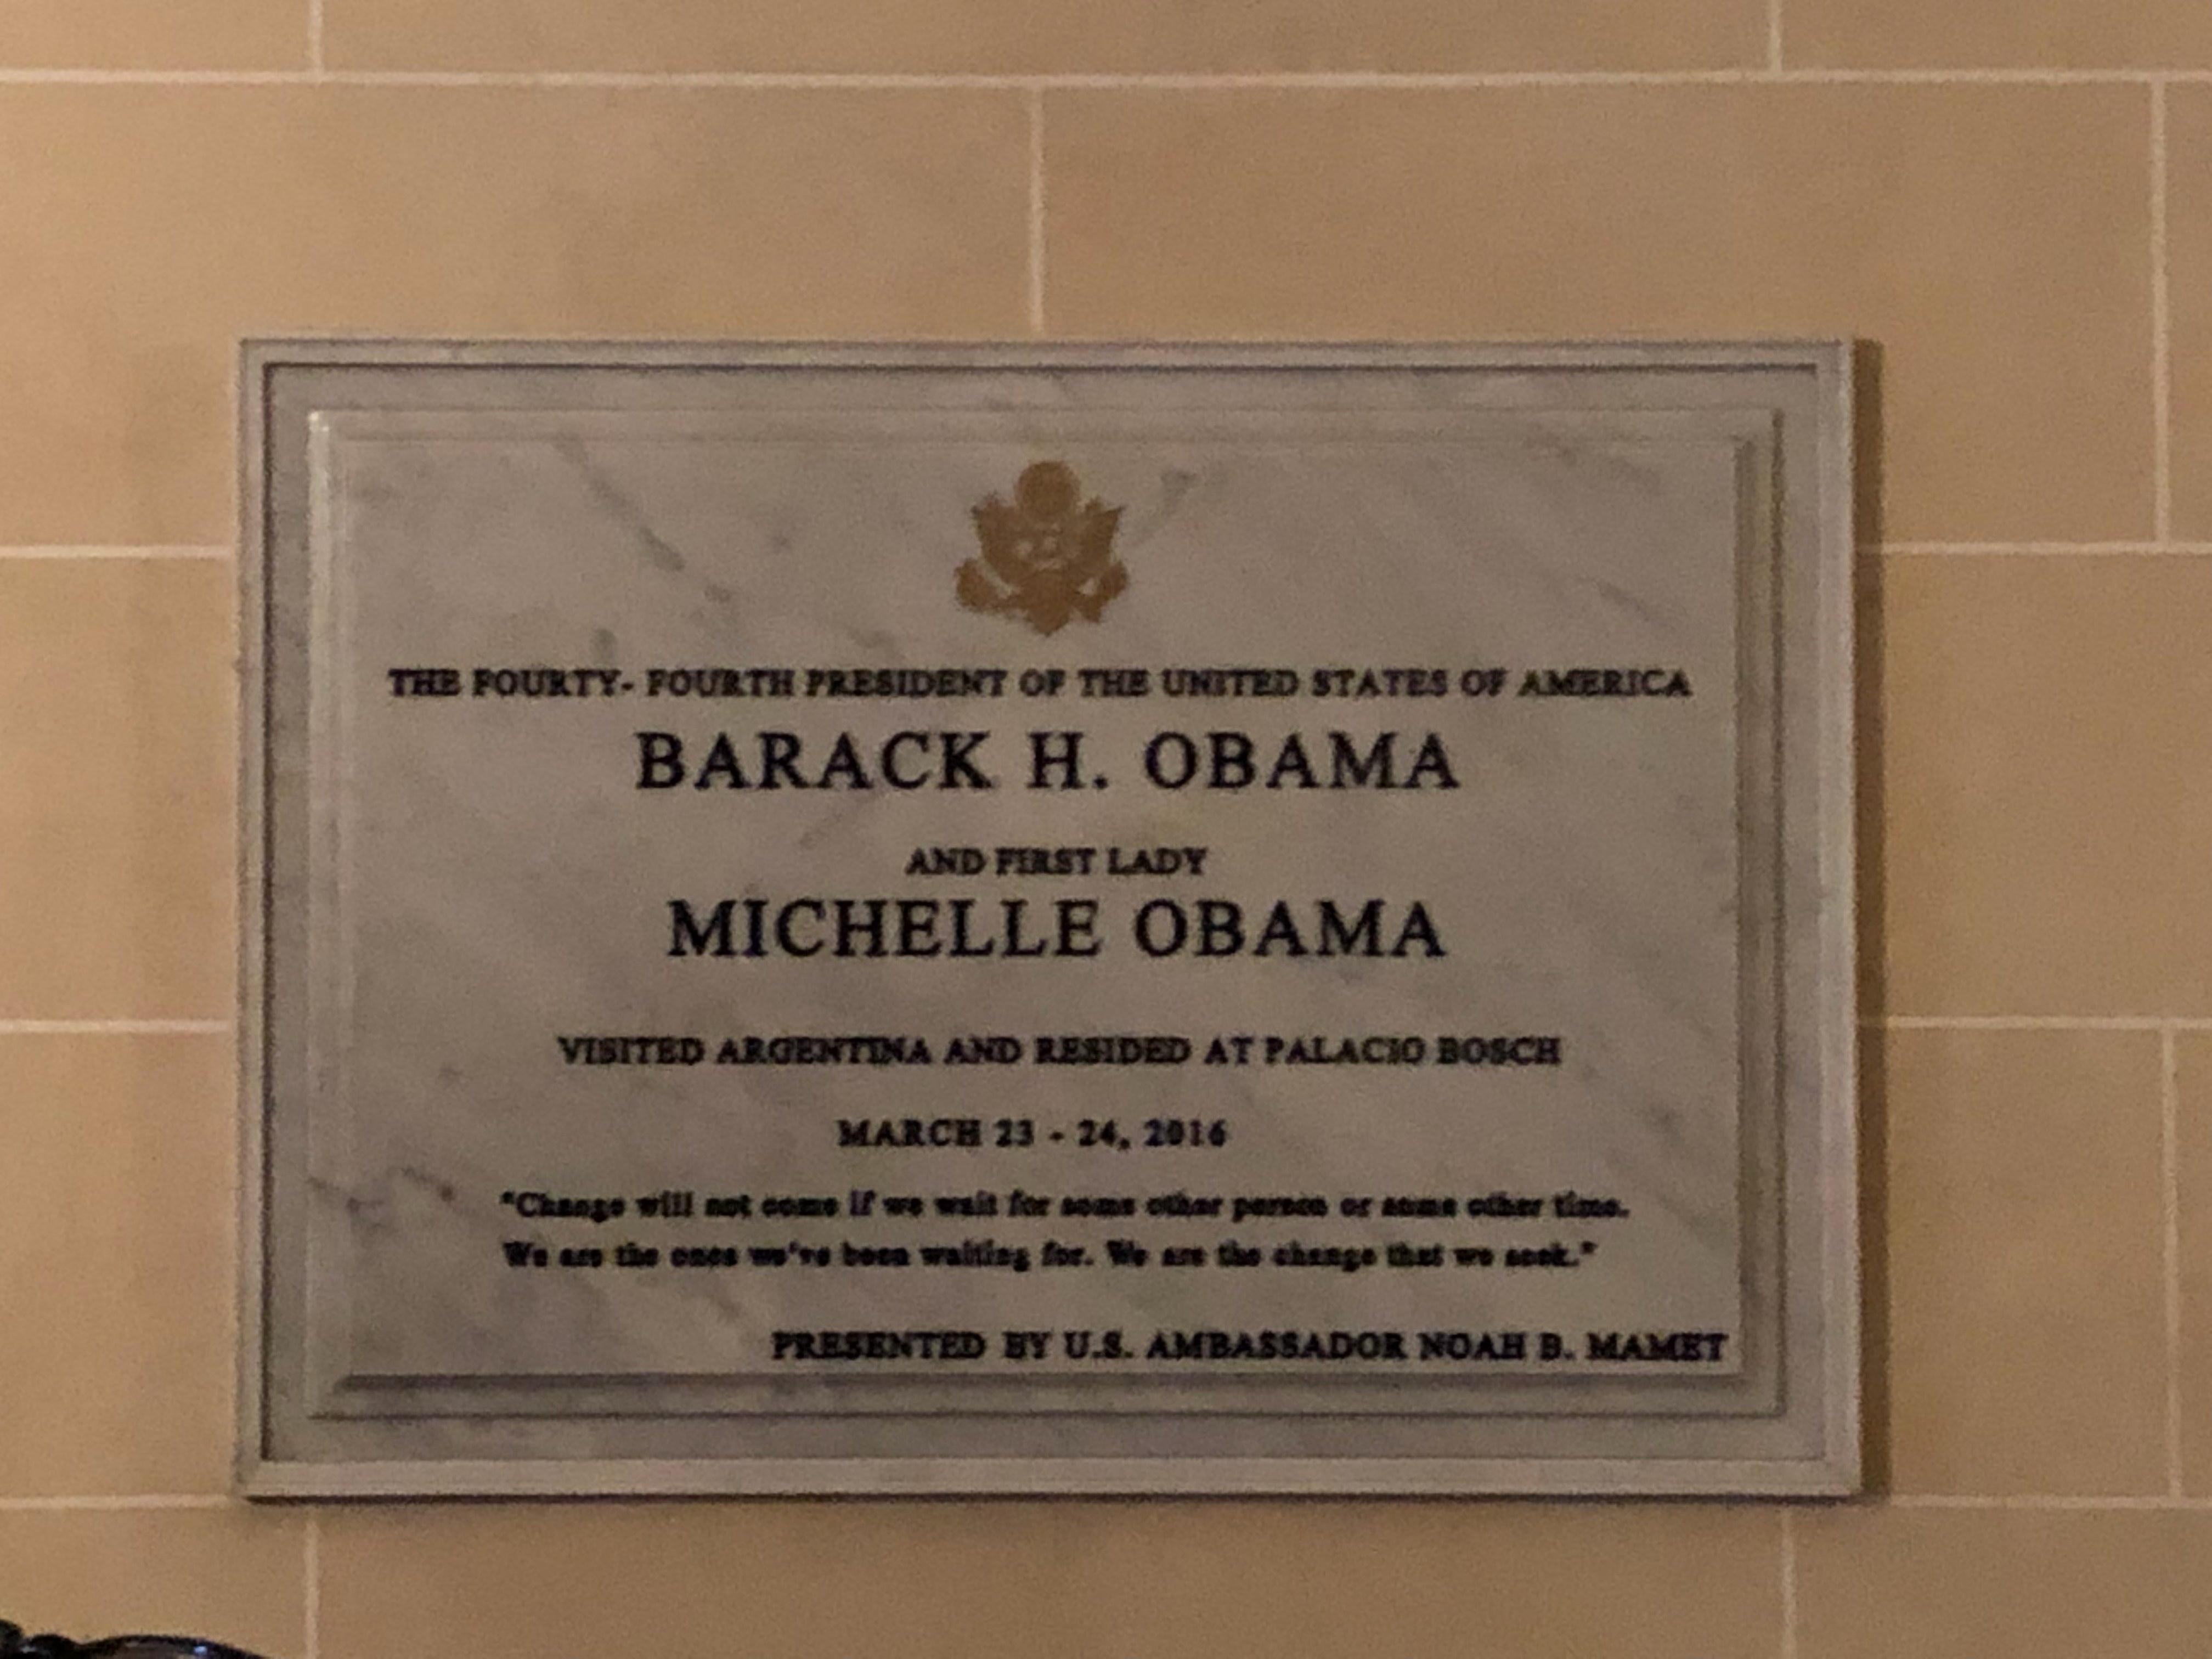 Plaque for President Obama & Michelle Obama